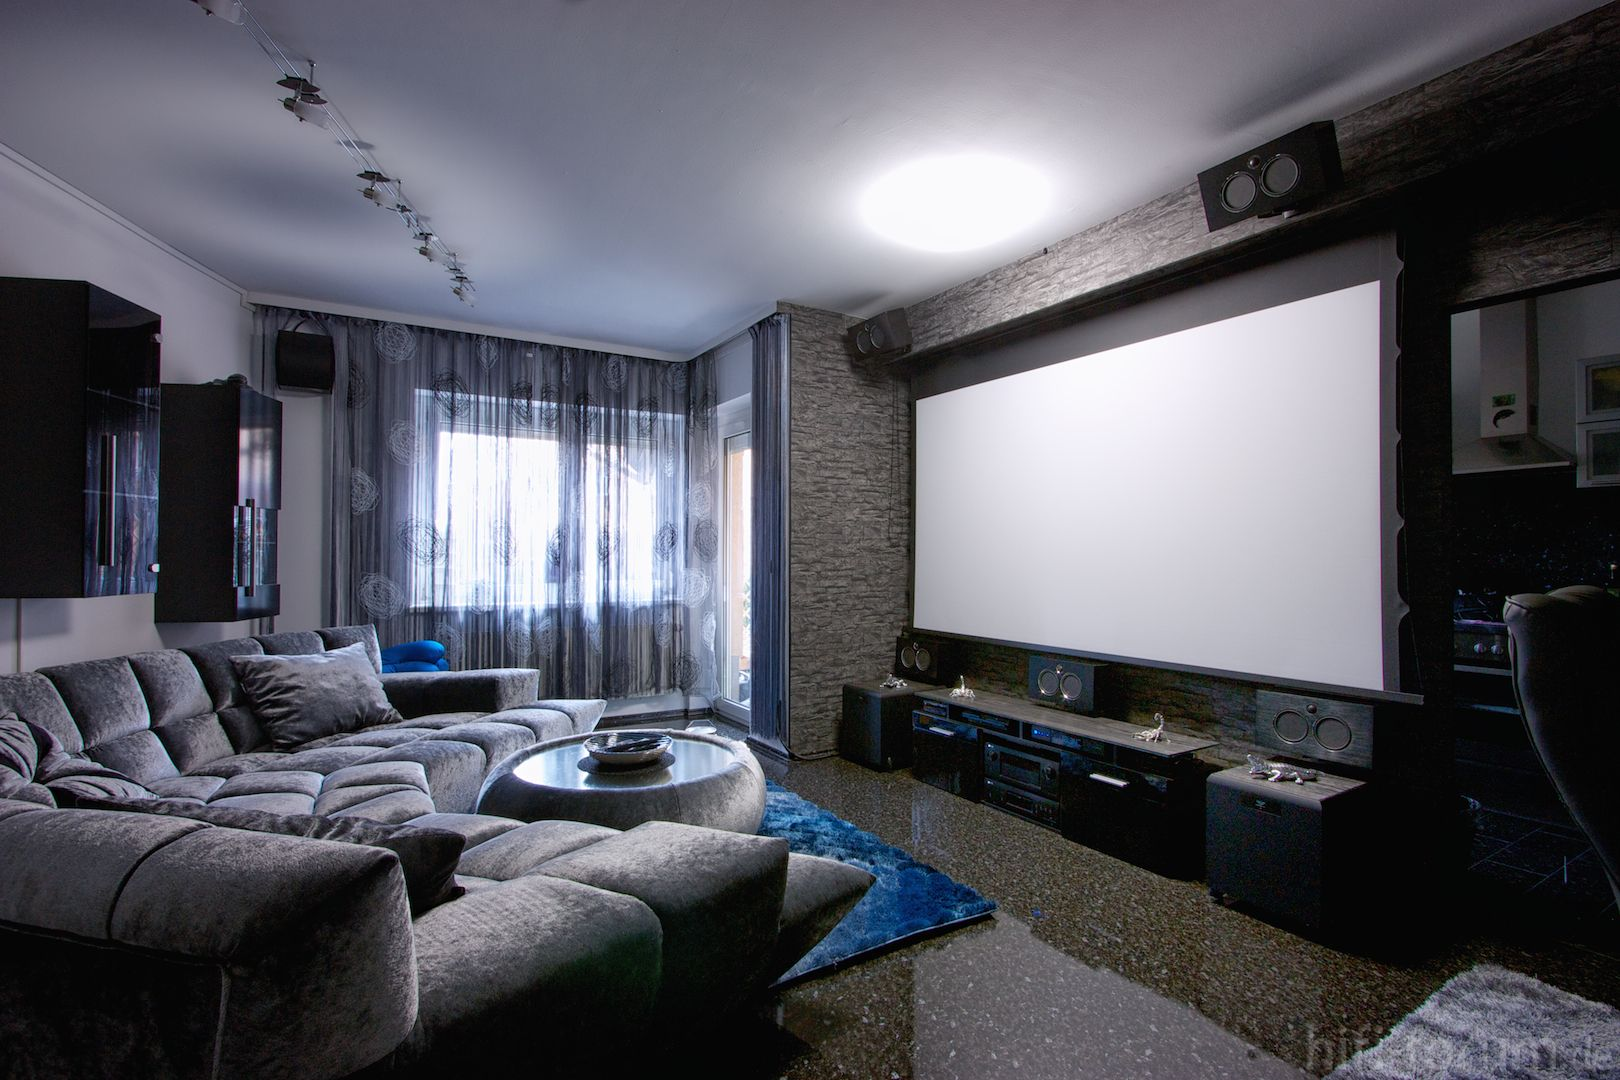 My Hometheater aka. Living room | Home theater seating ...